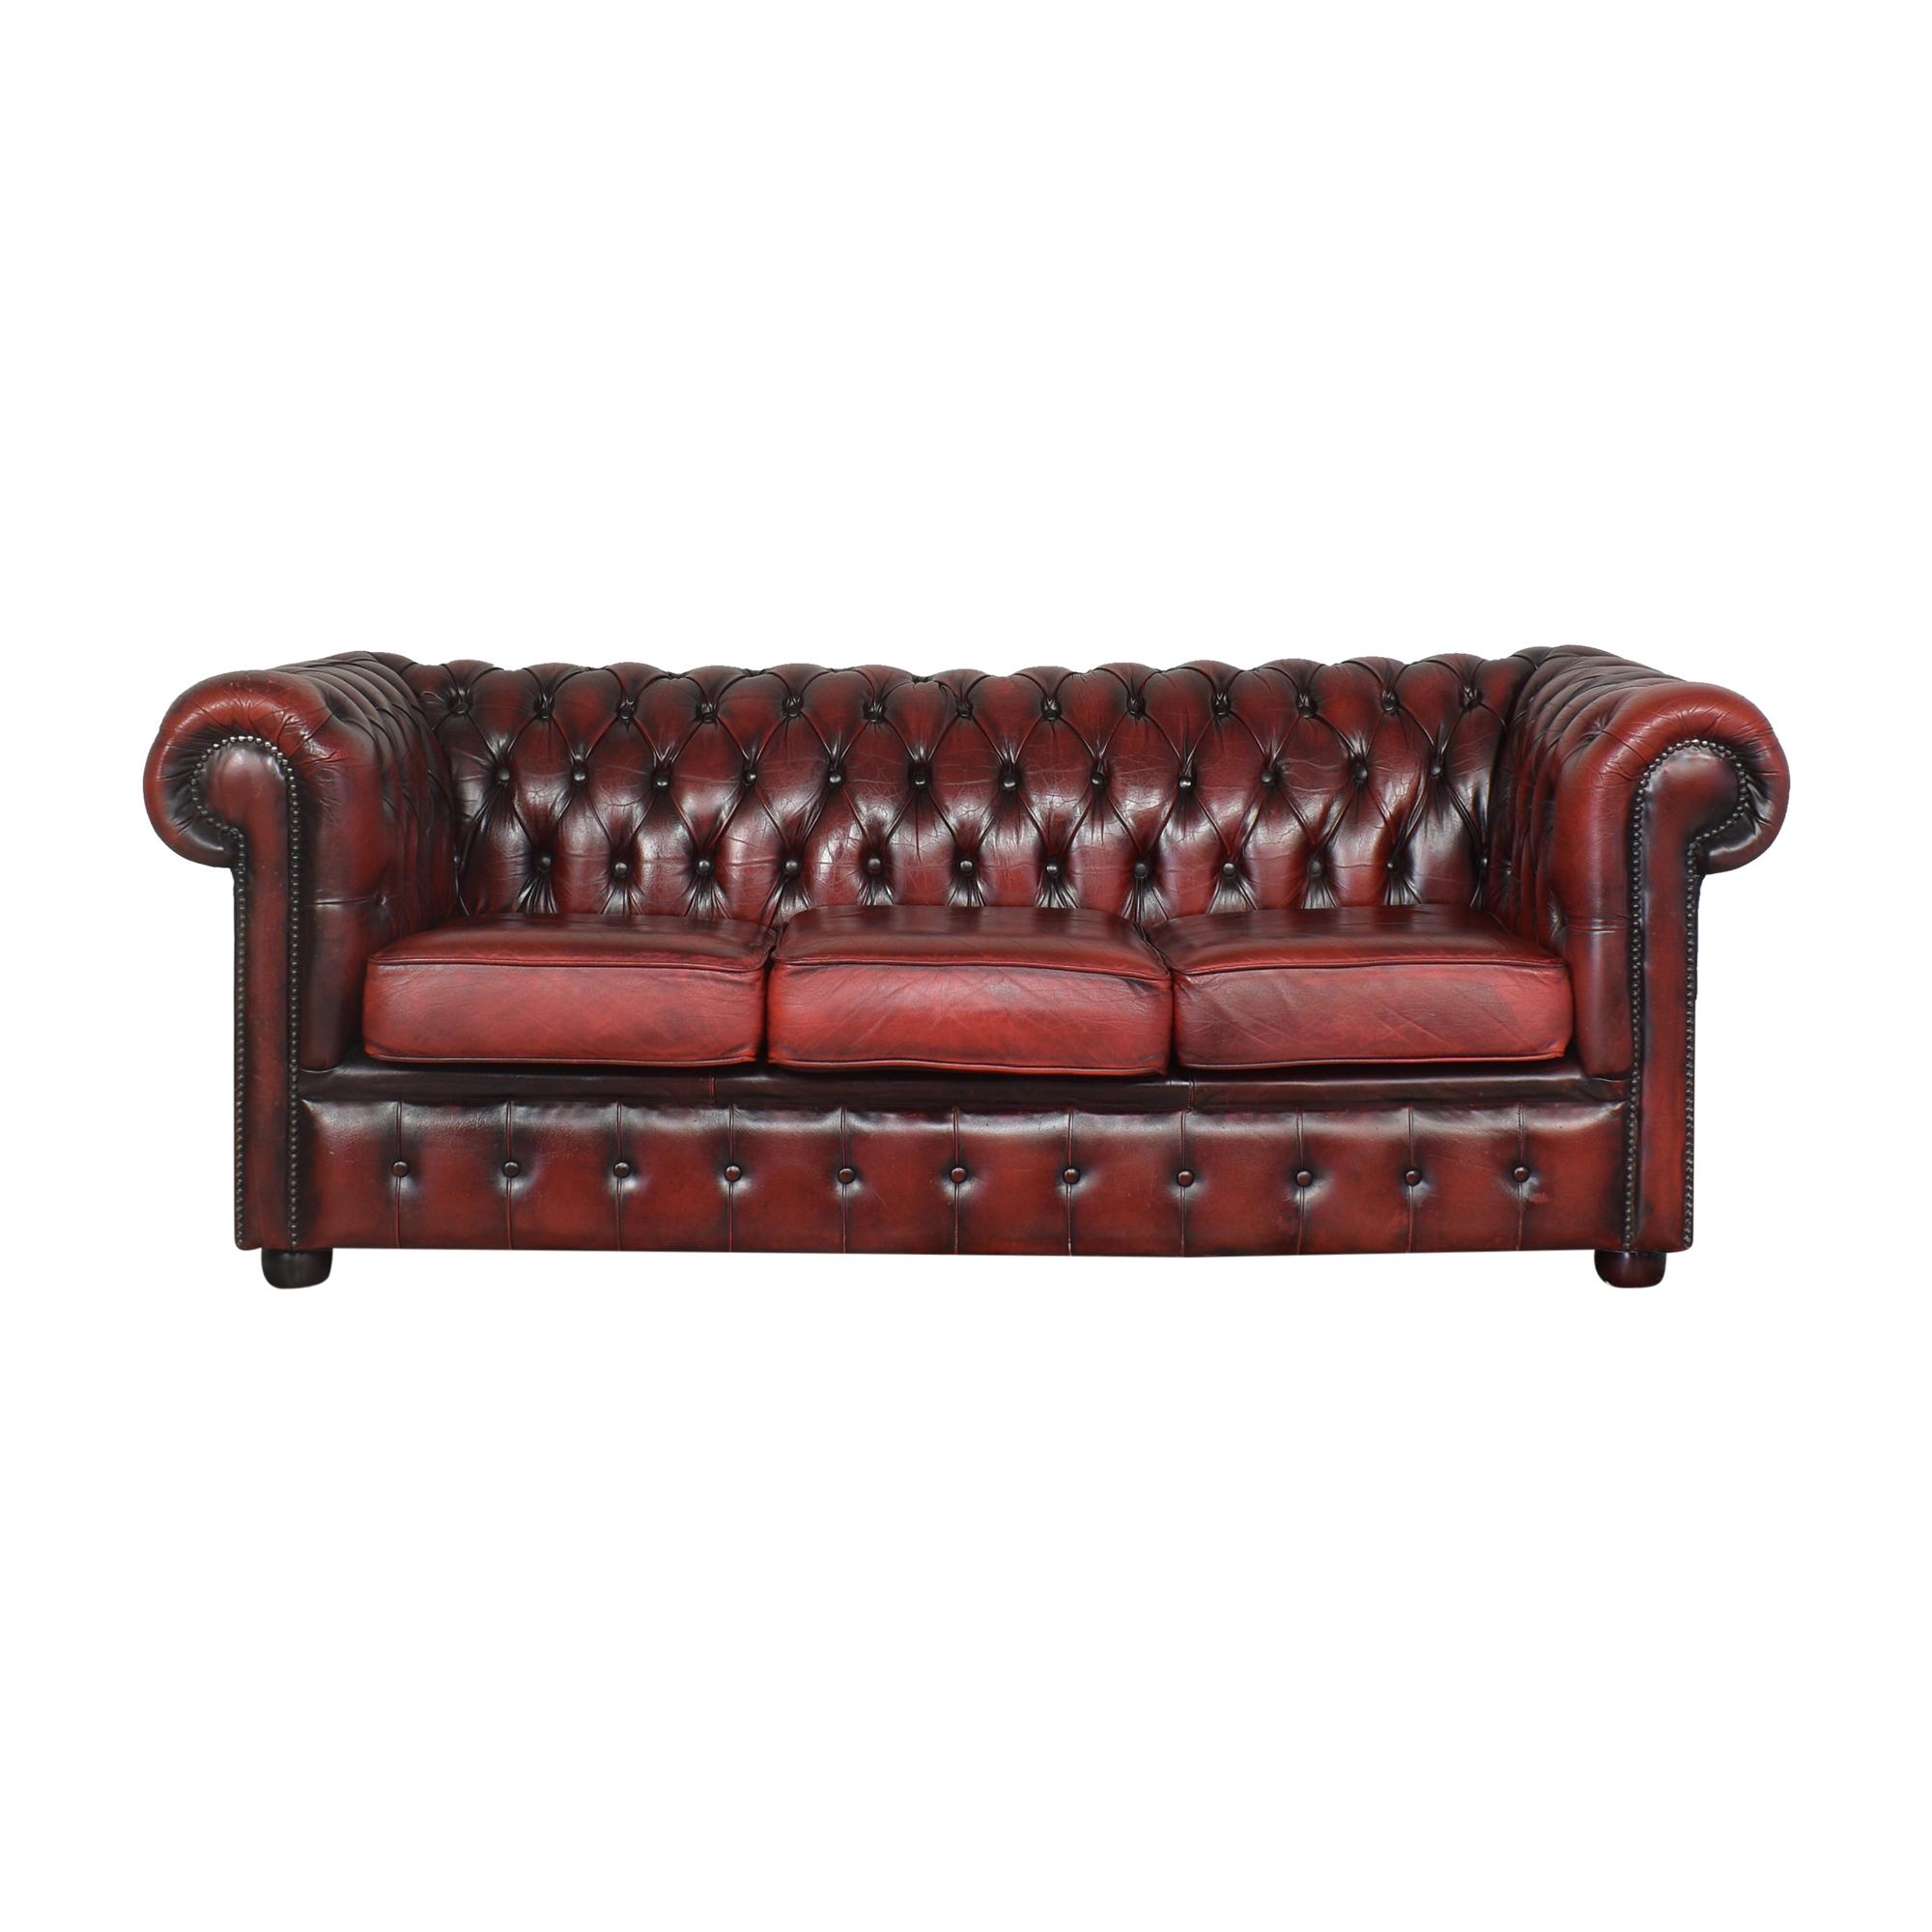 buy Chesterfield.com Chesterfield.com Brighton Sofa online